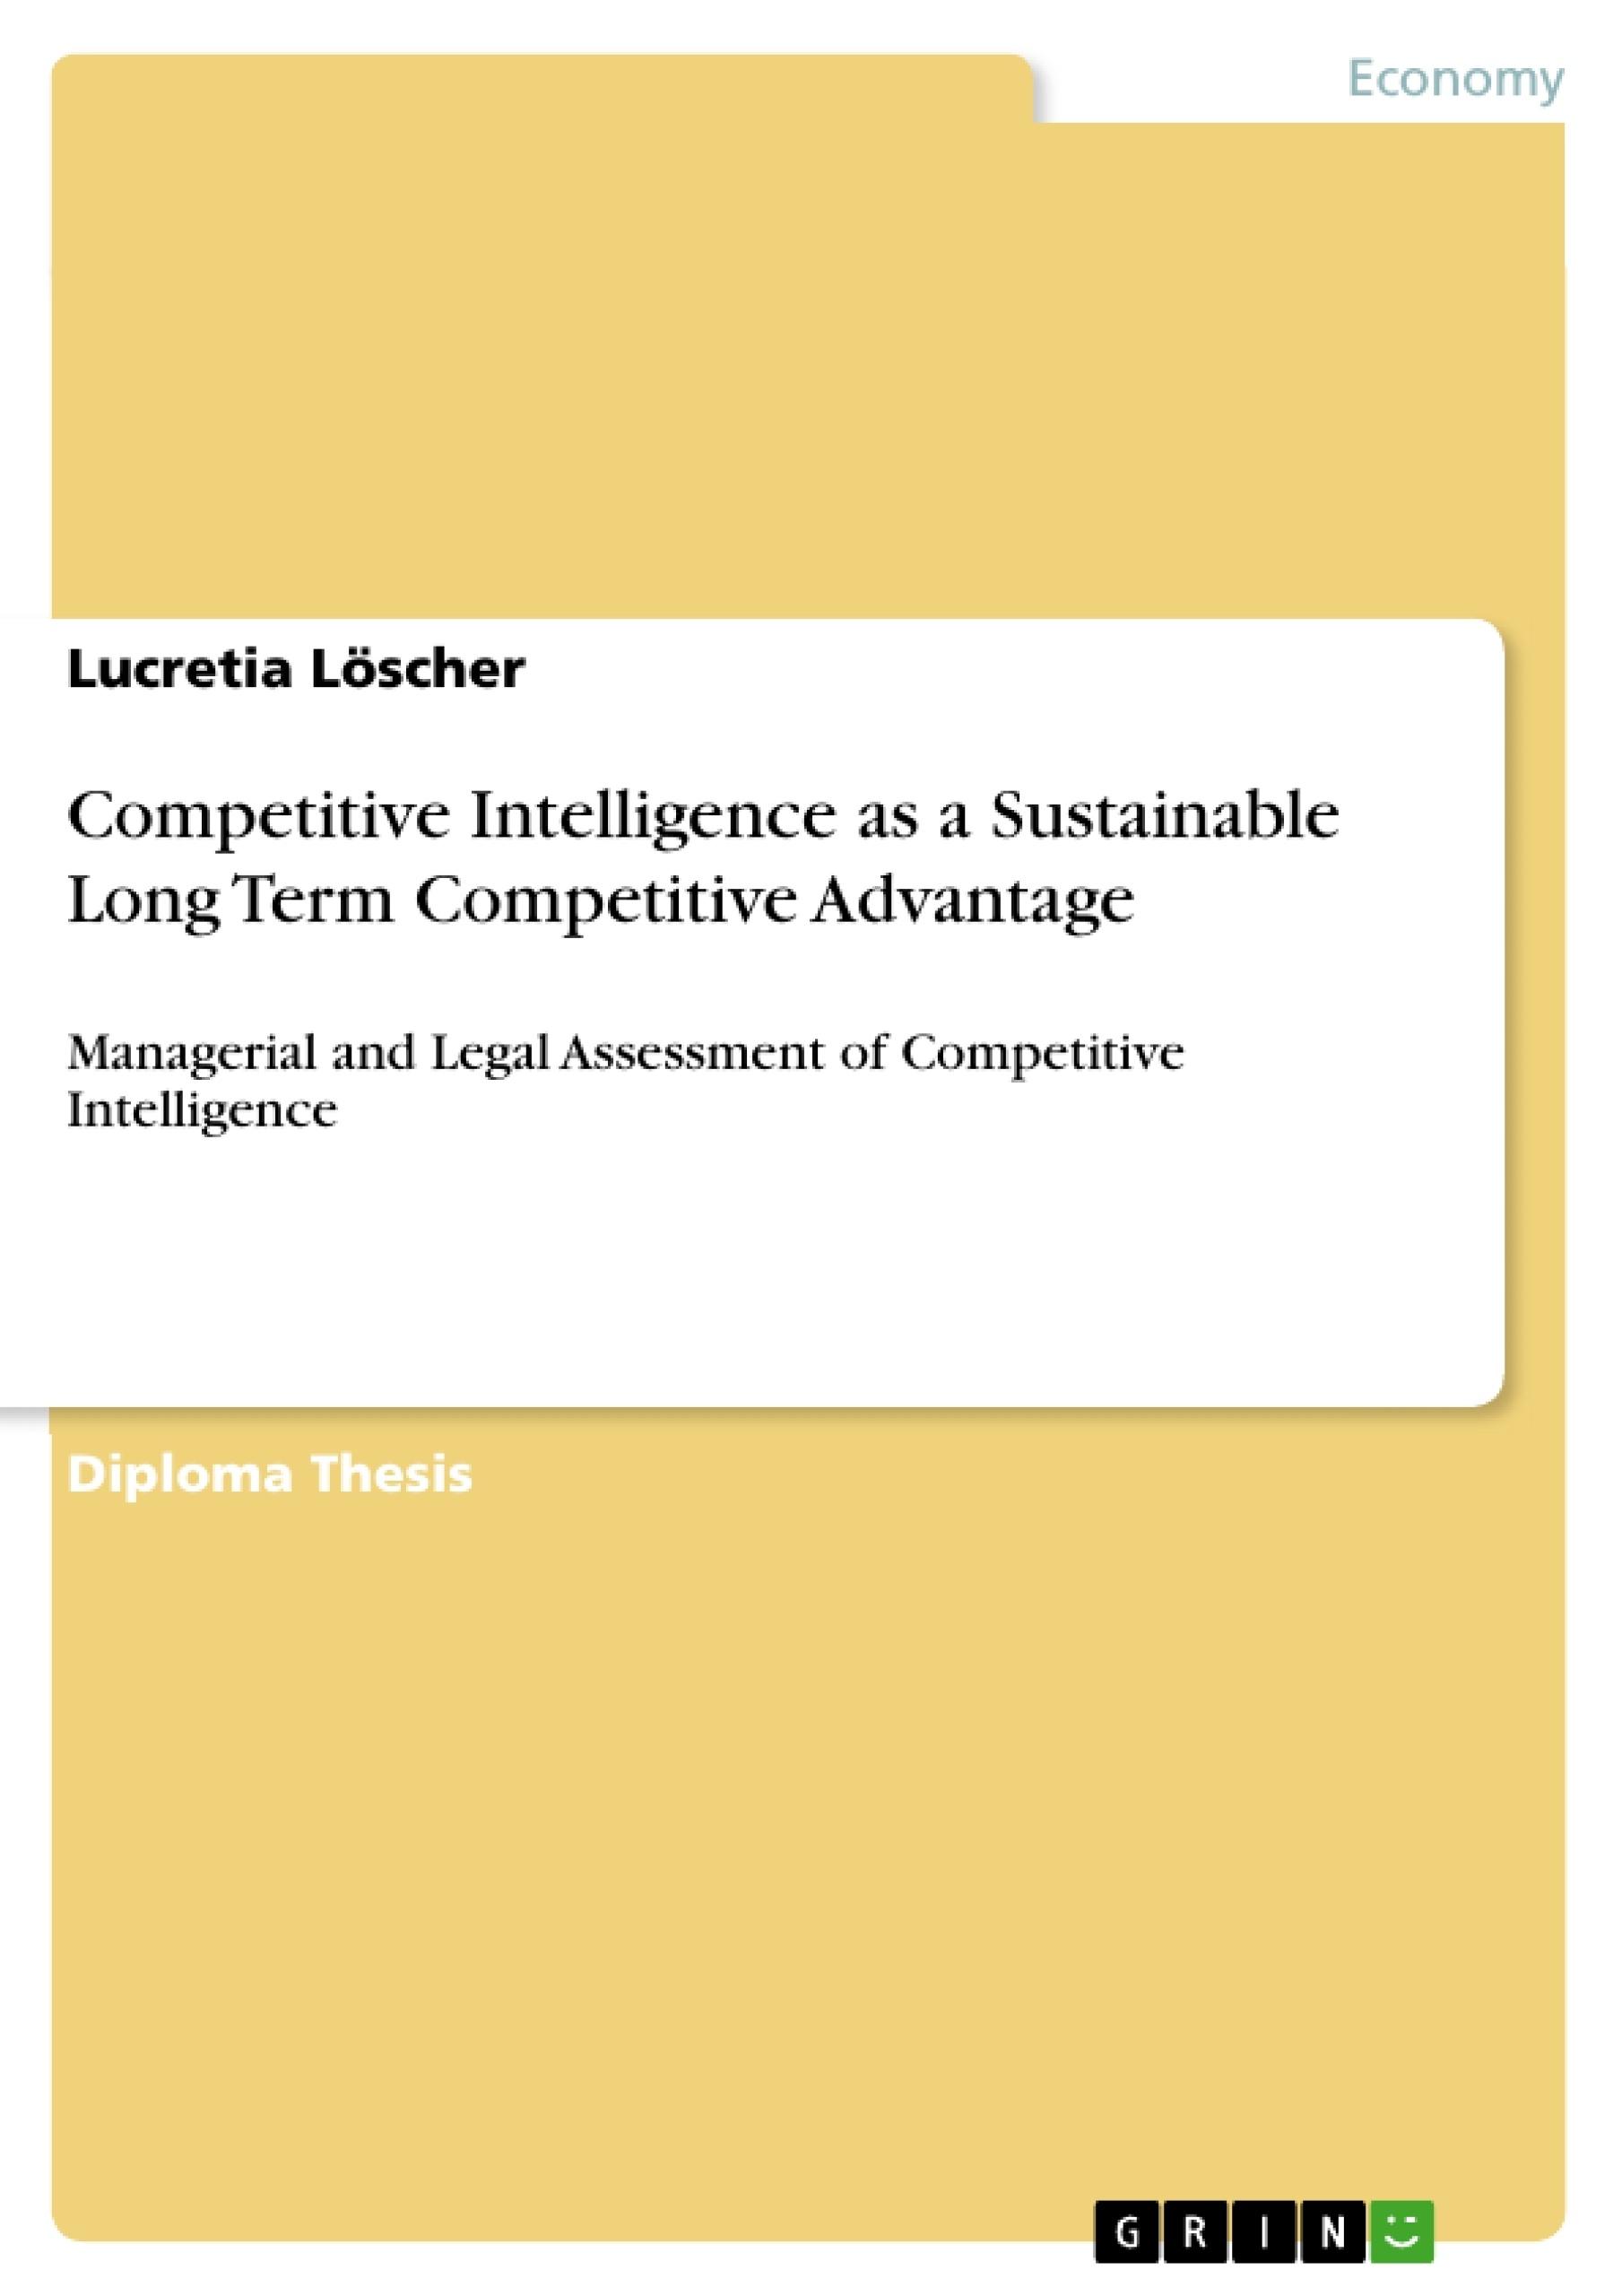 dissertation competitive intelligence